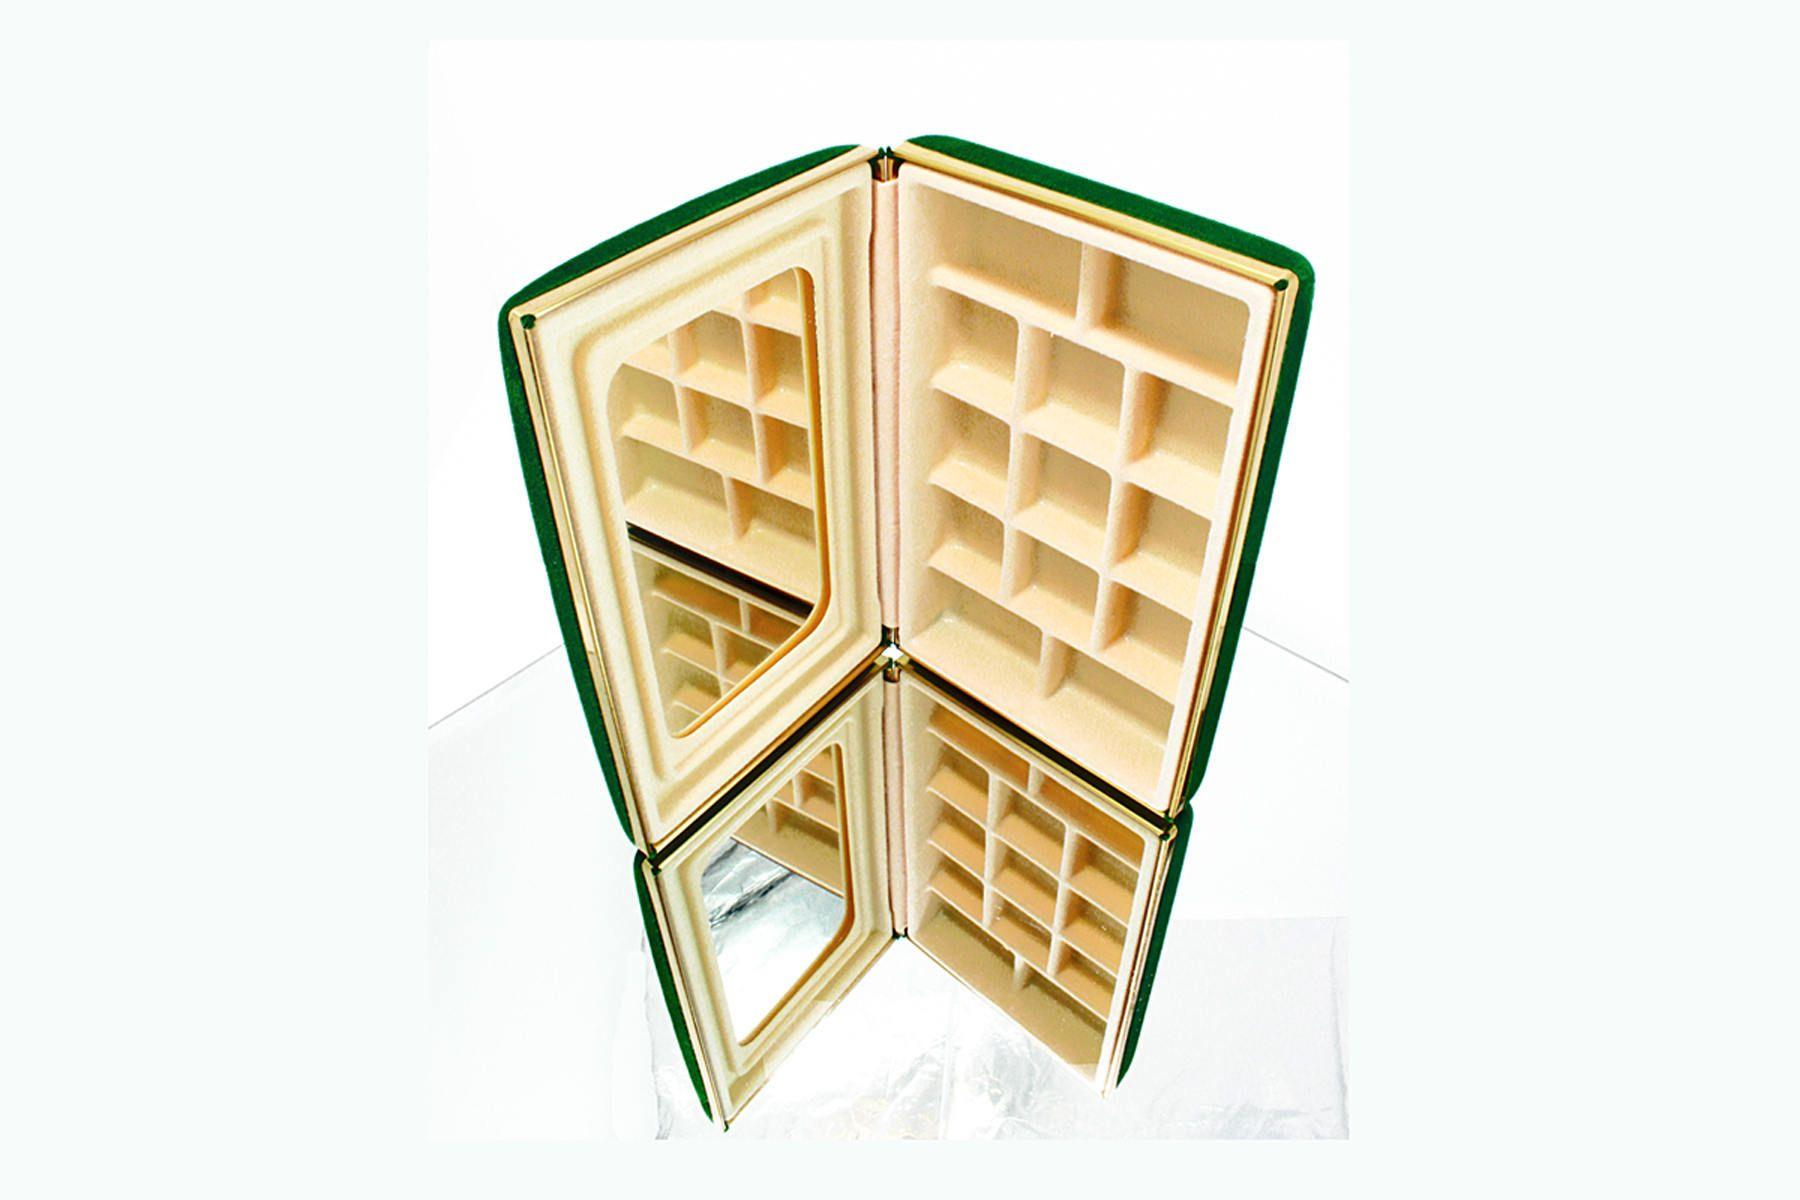 Vintage Jewelry Box Compact Travel Jewelry Organizer Case Green